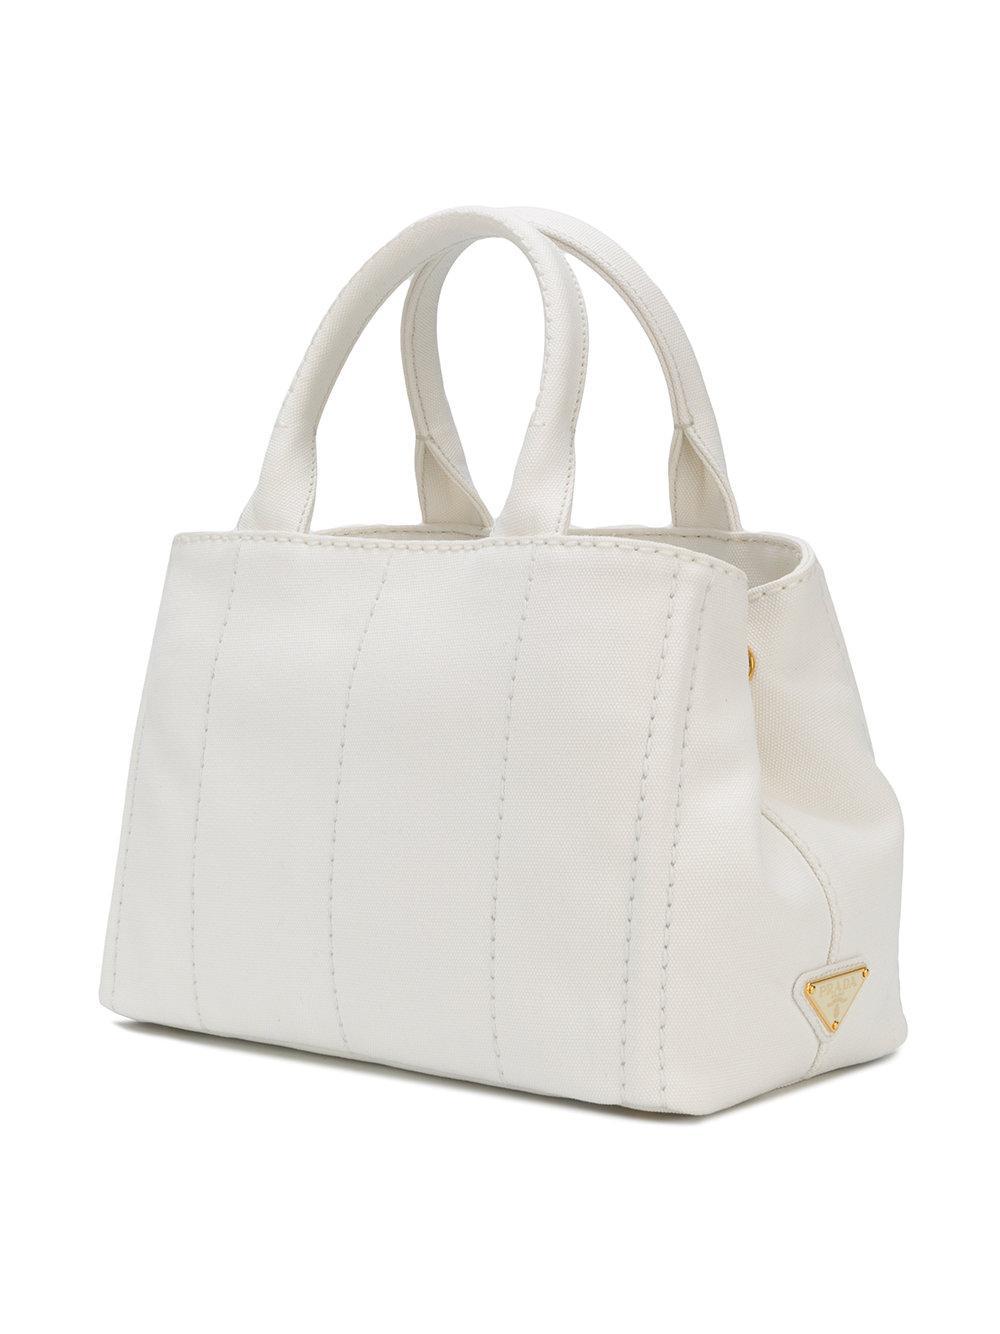 b6b1952ff84b Prada Giardiniera Tote Bag in White - Lyst